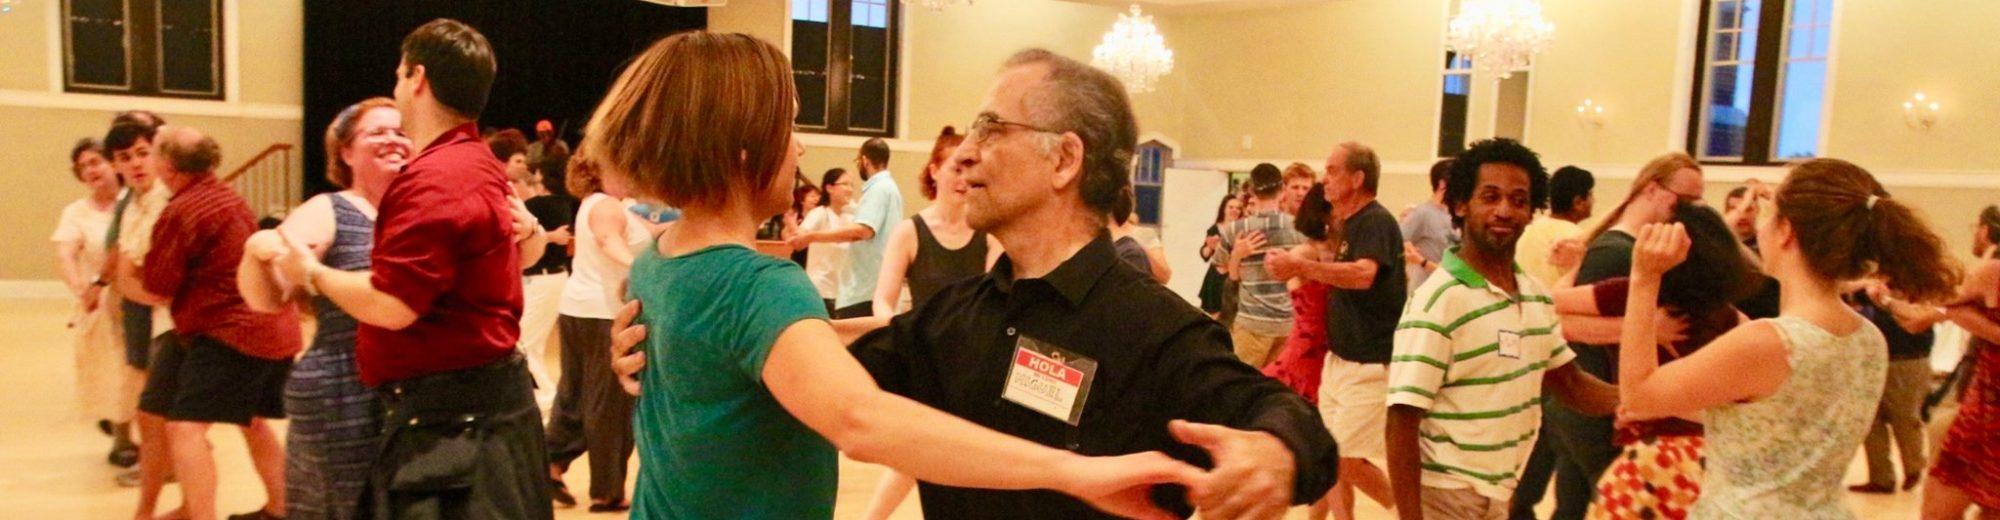 Chicago Barn Dance Company